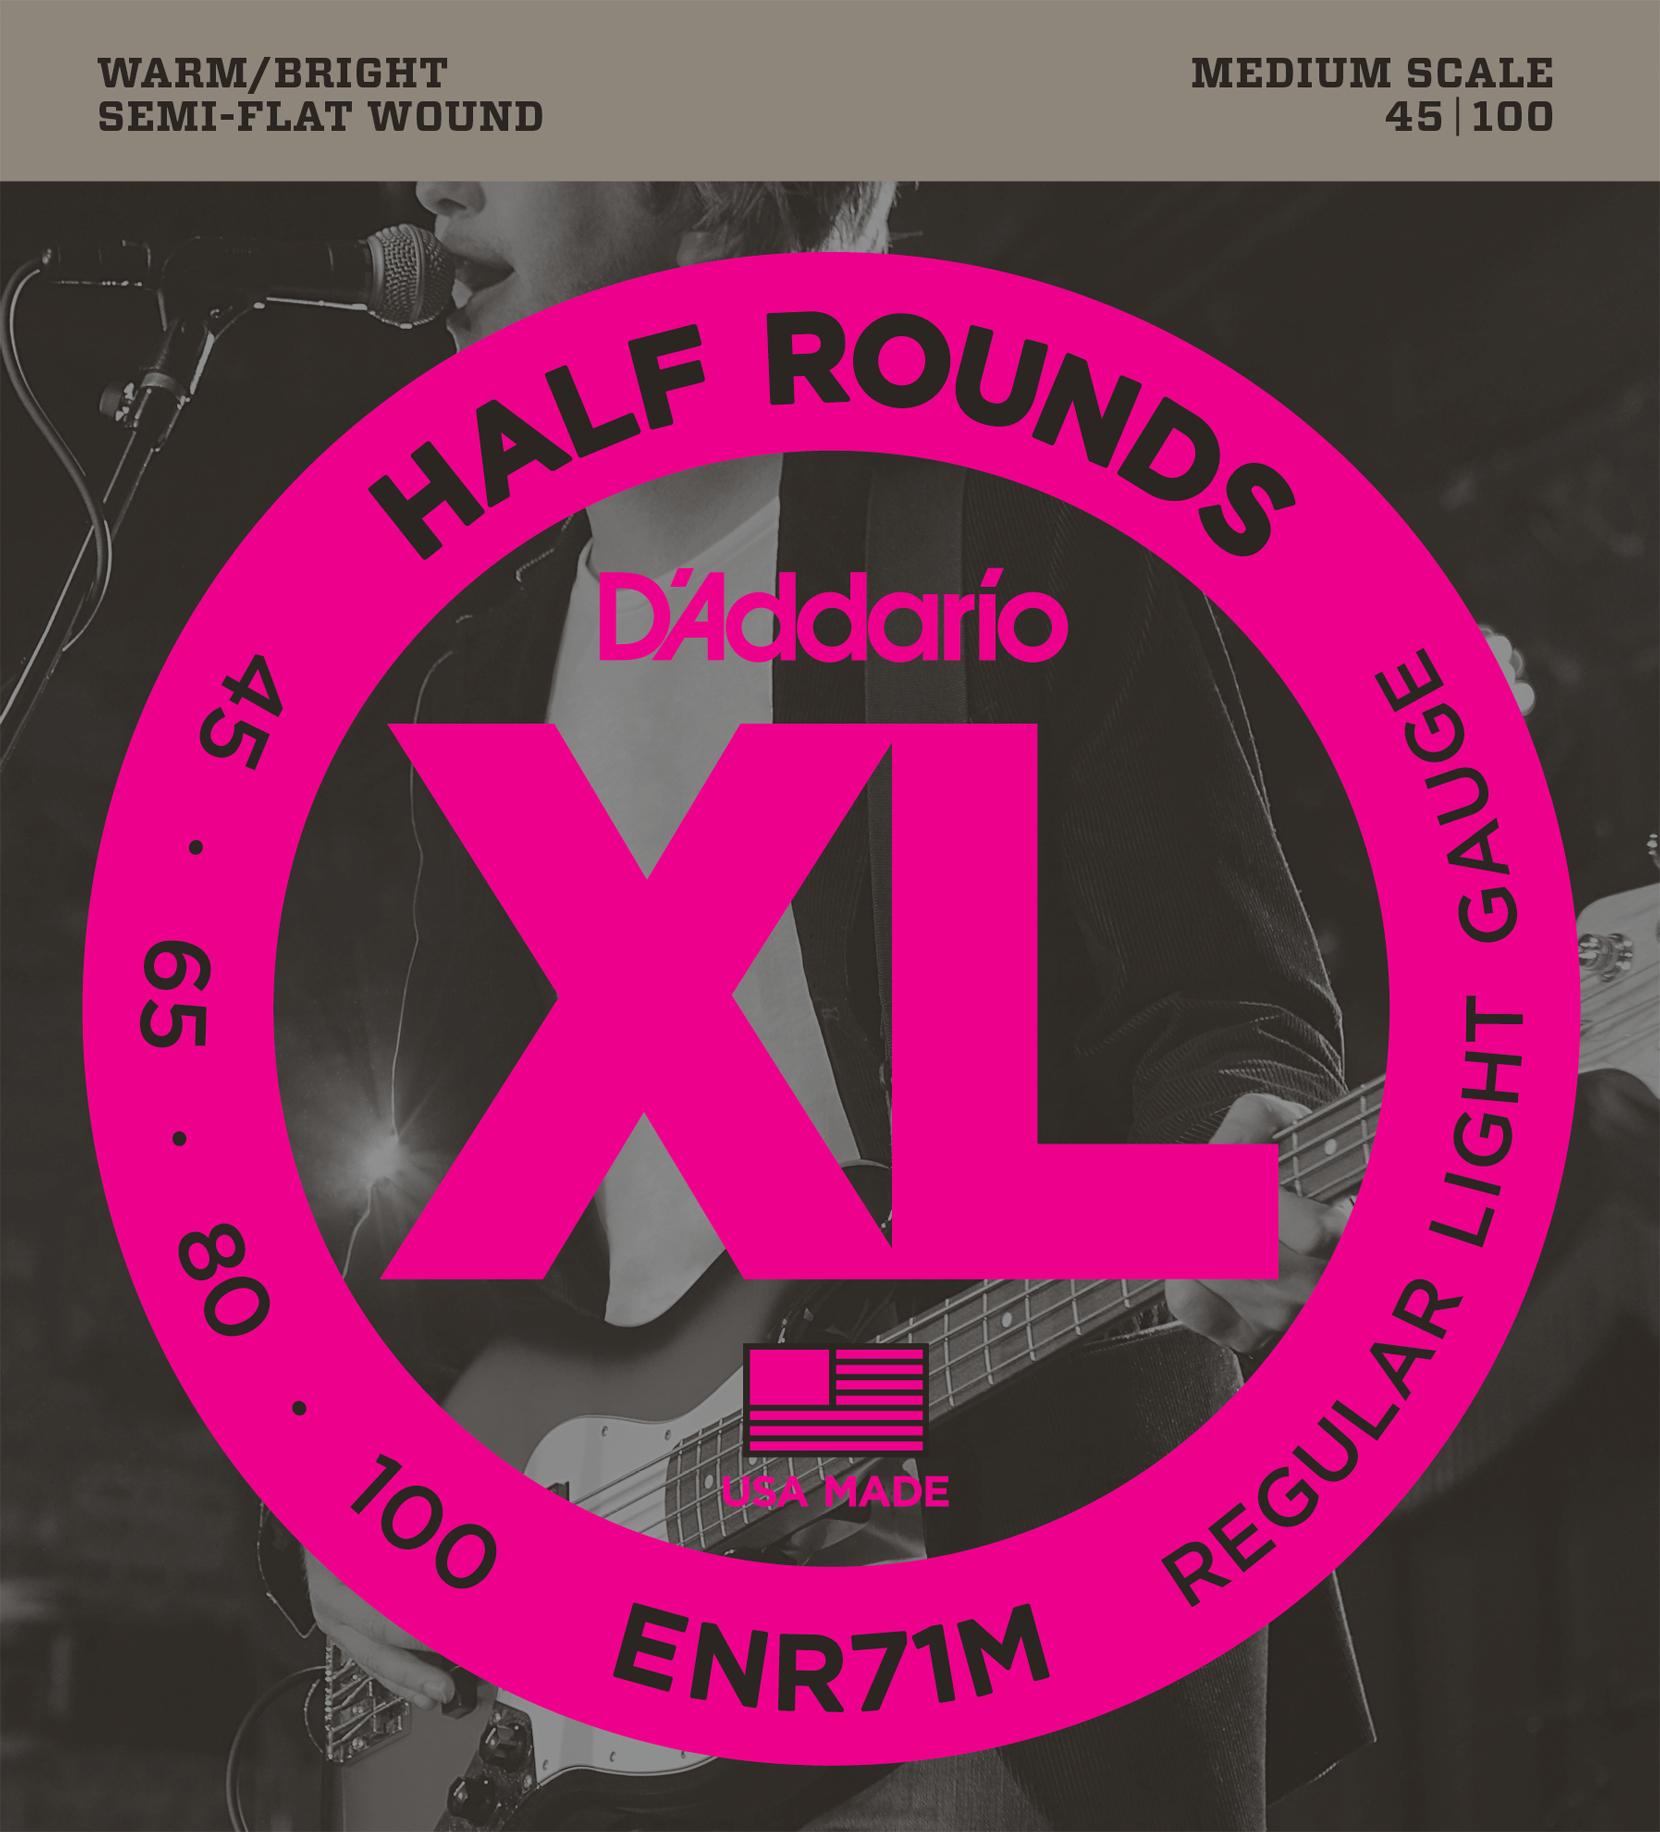 D'addario ENR71M semi-flat wound medium scale 45-100 Bass string set